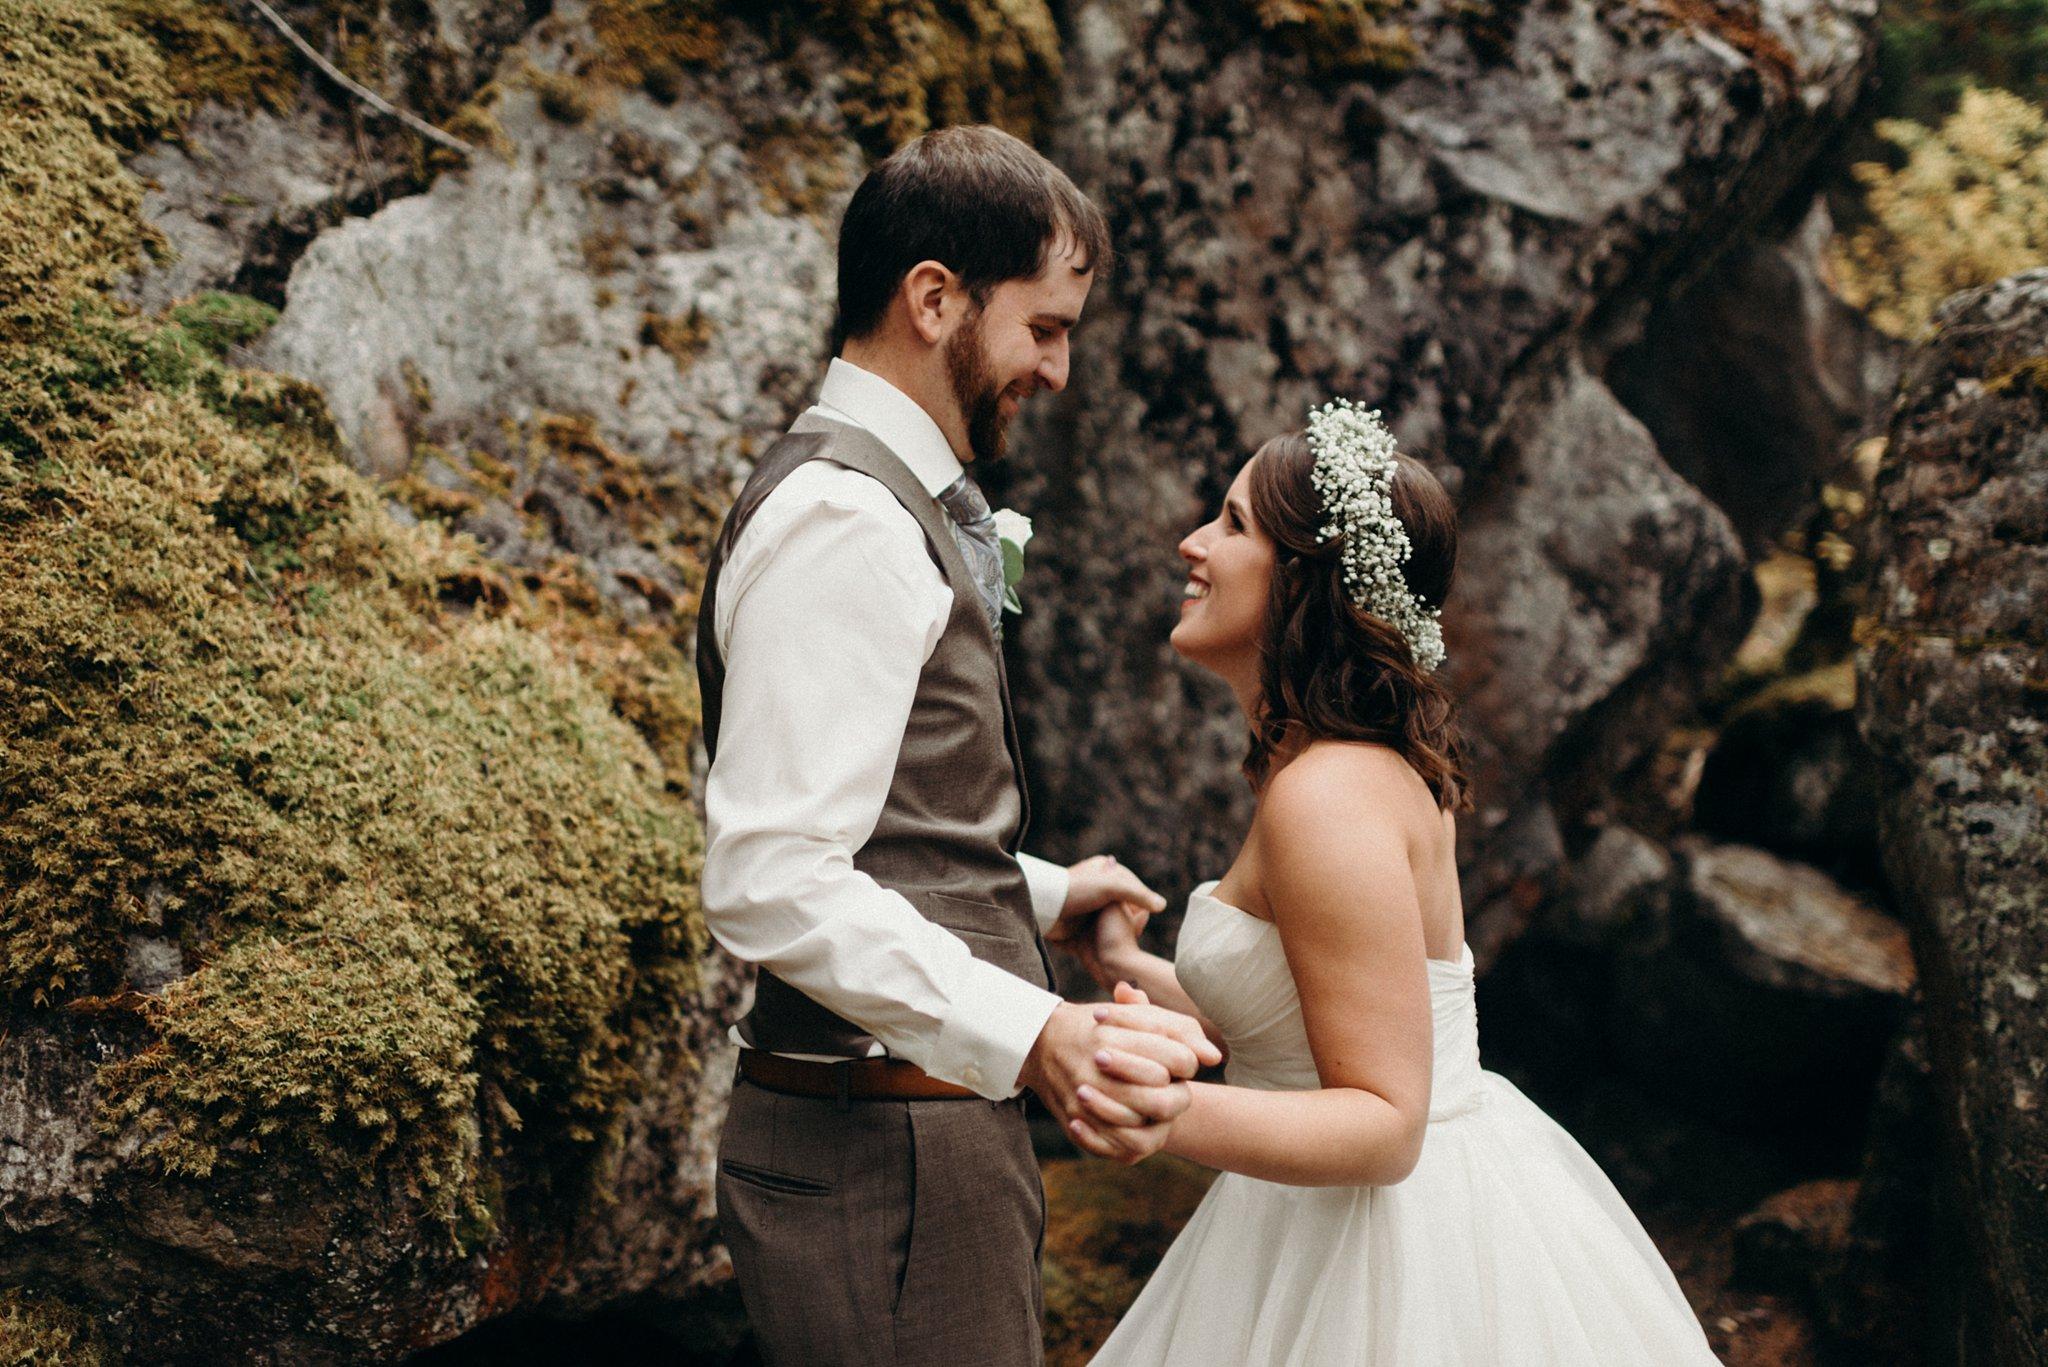 kaihla_tonai_intimate_wedding_elopement_photographer_6903.jpg